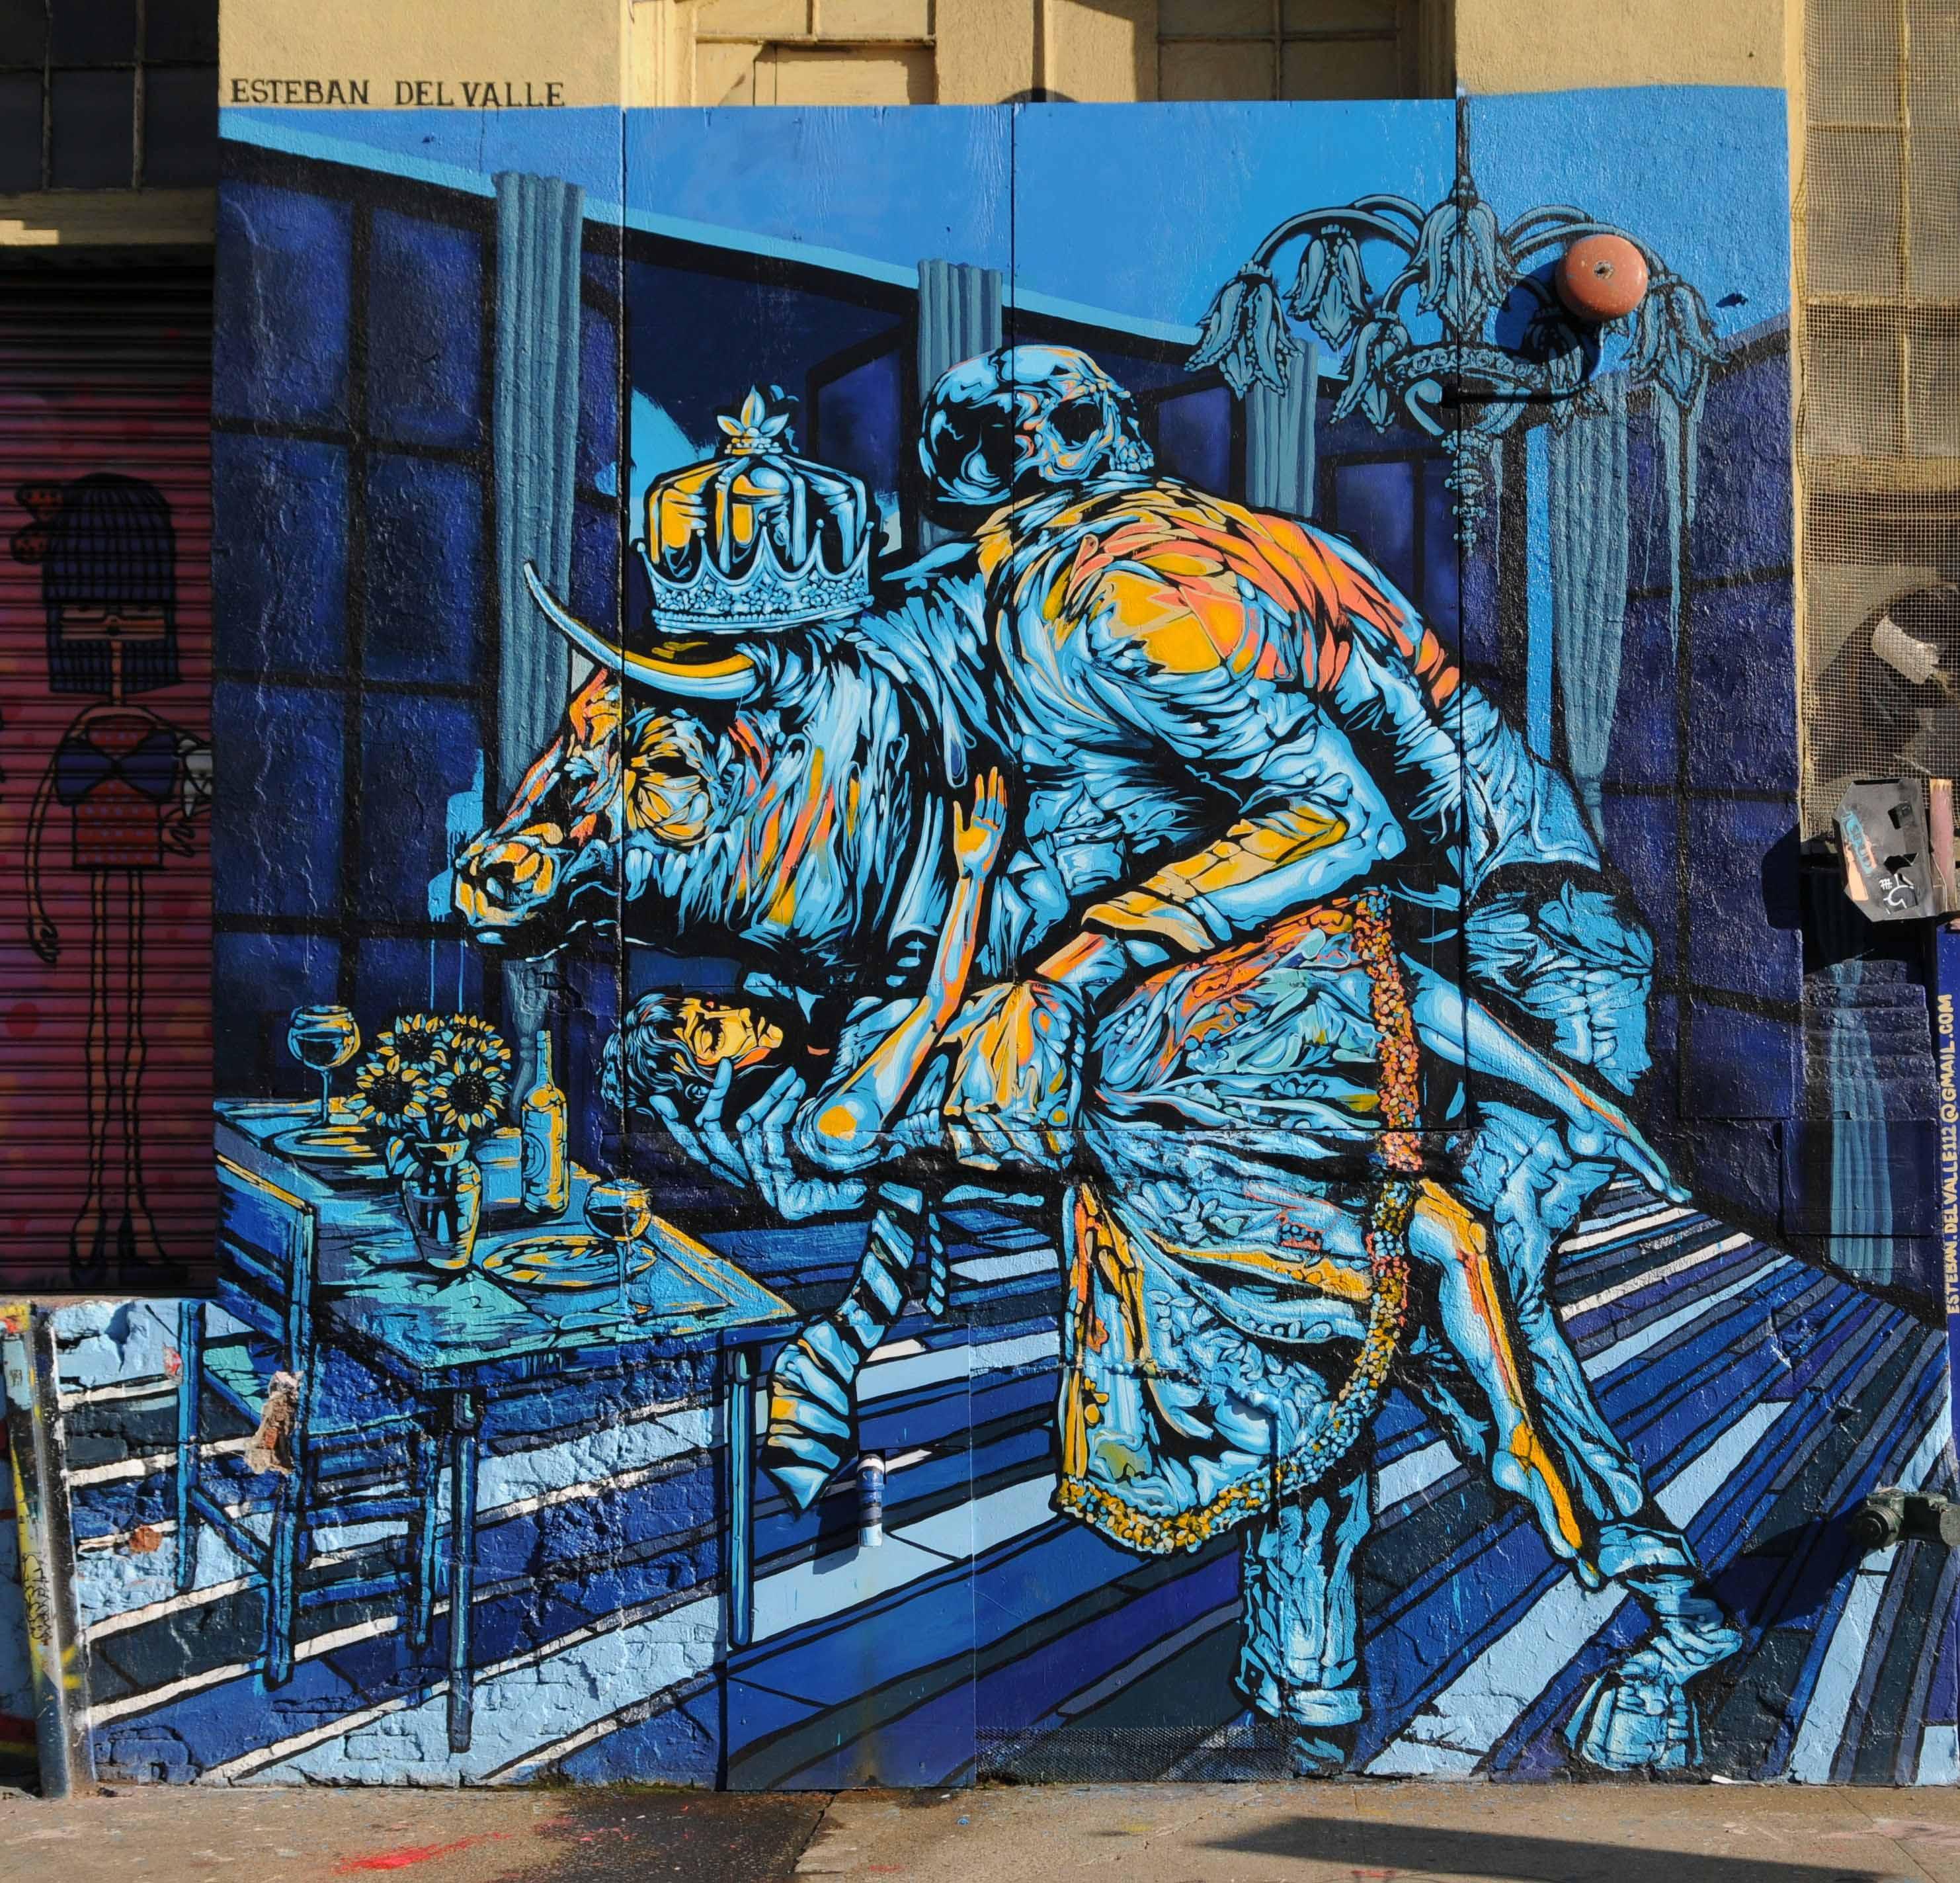 Graffiti as Art – The Science Survey